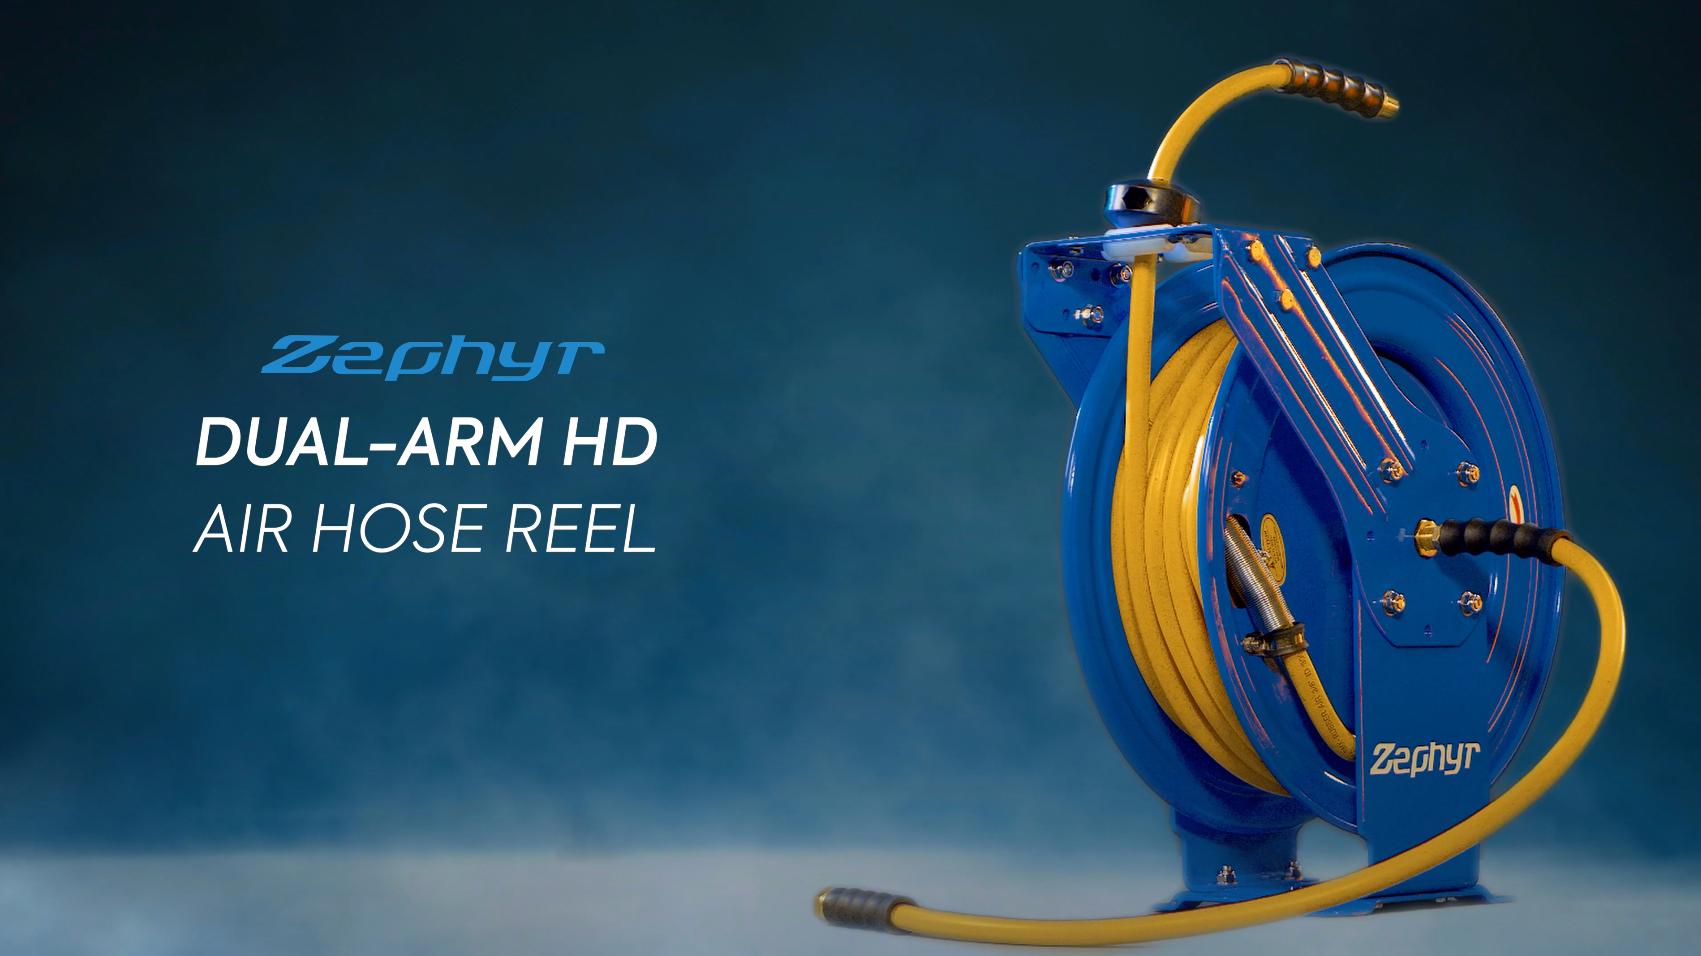 Zephyr - Air Hose Reels - Video Catalog